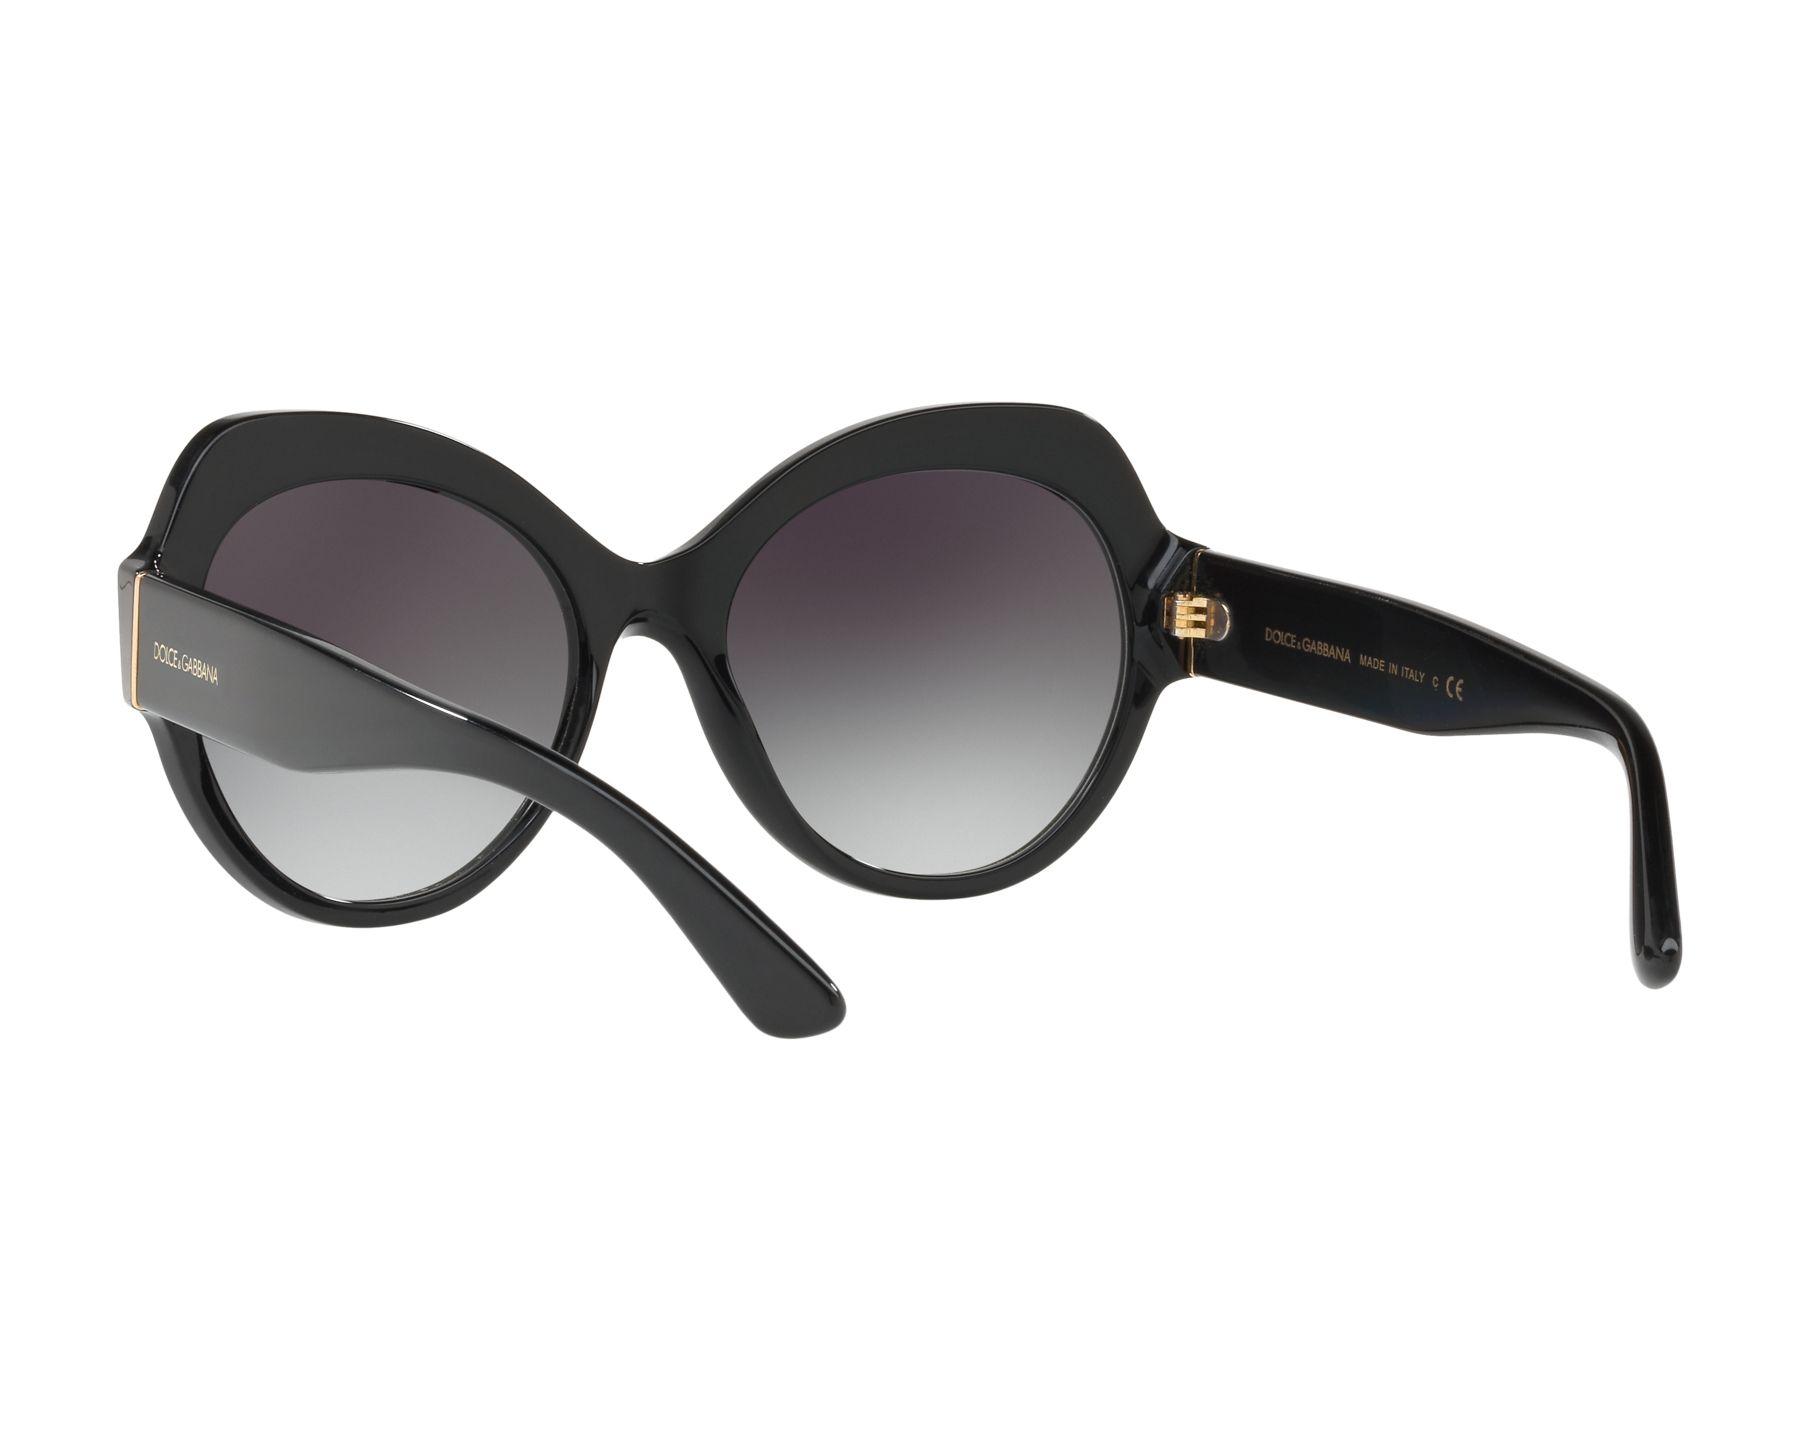 Dolce Gabbana 4320/501/8g Jx6vJ2zhpX